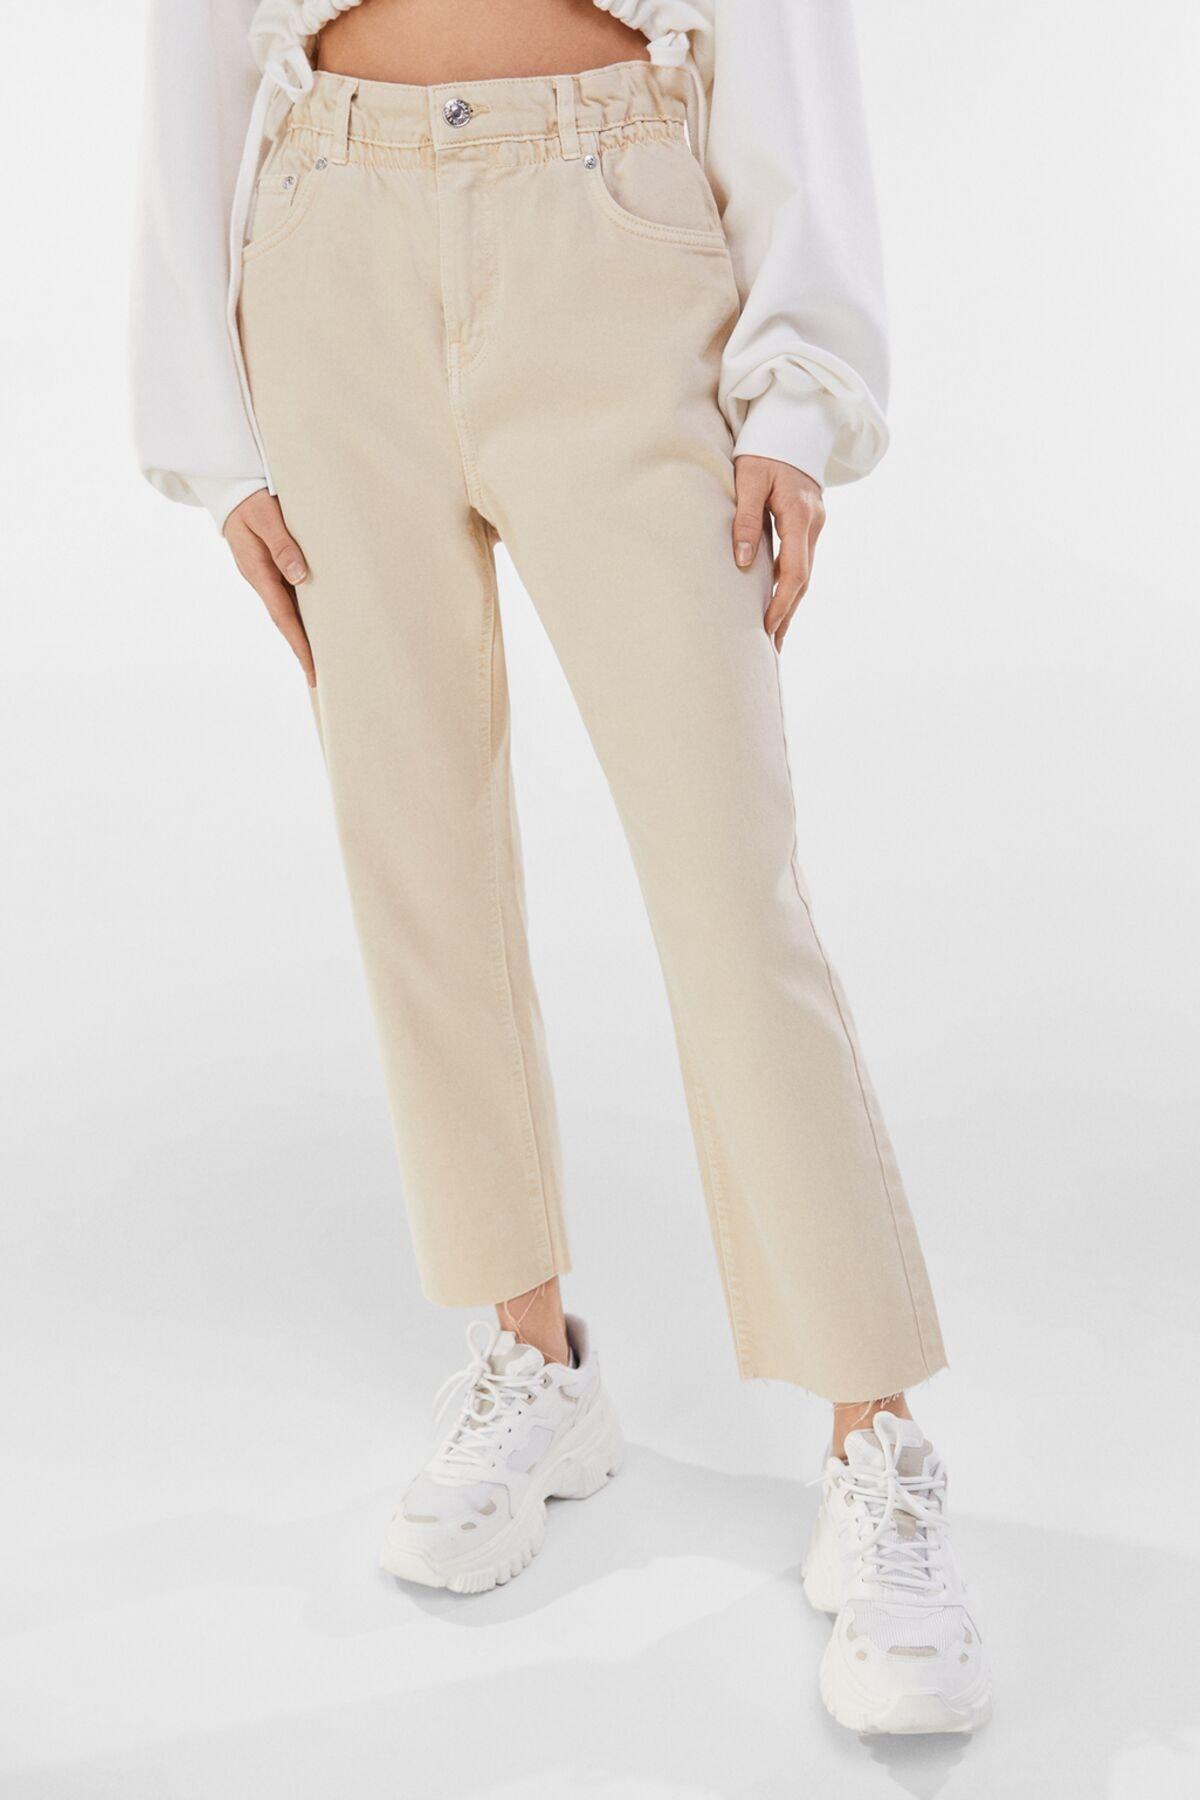 Bershka Kadın Kum Rengi Fitilli Crop Straight Fit Pantolon